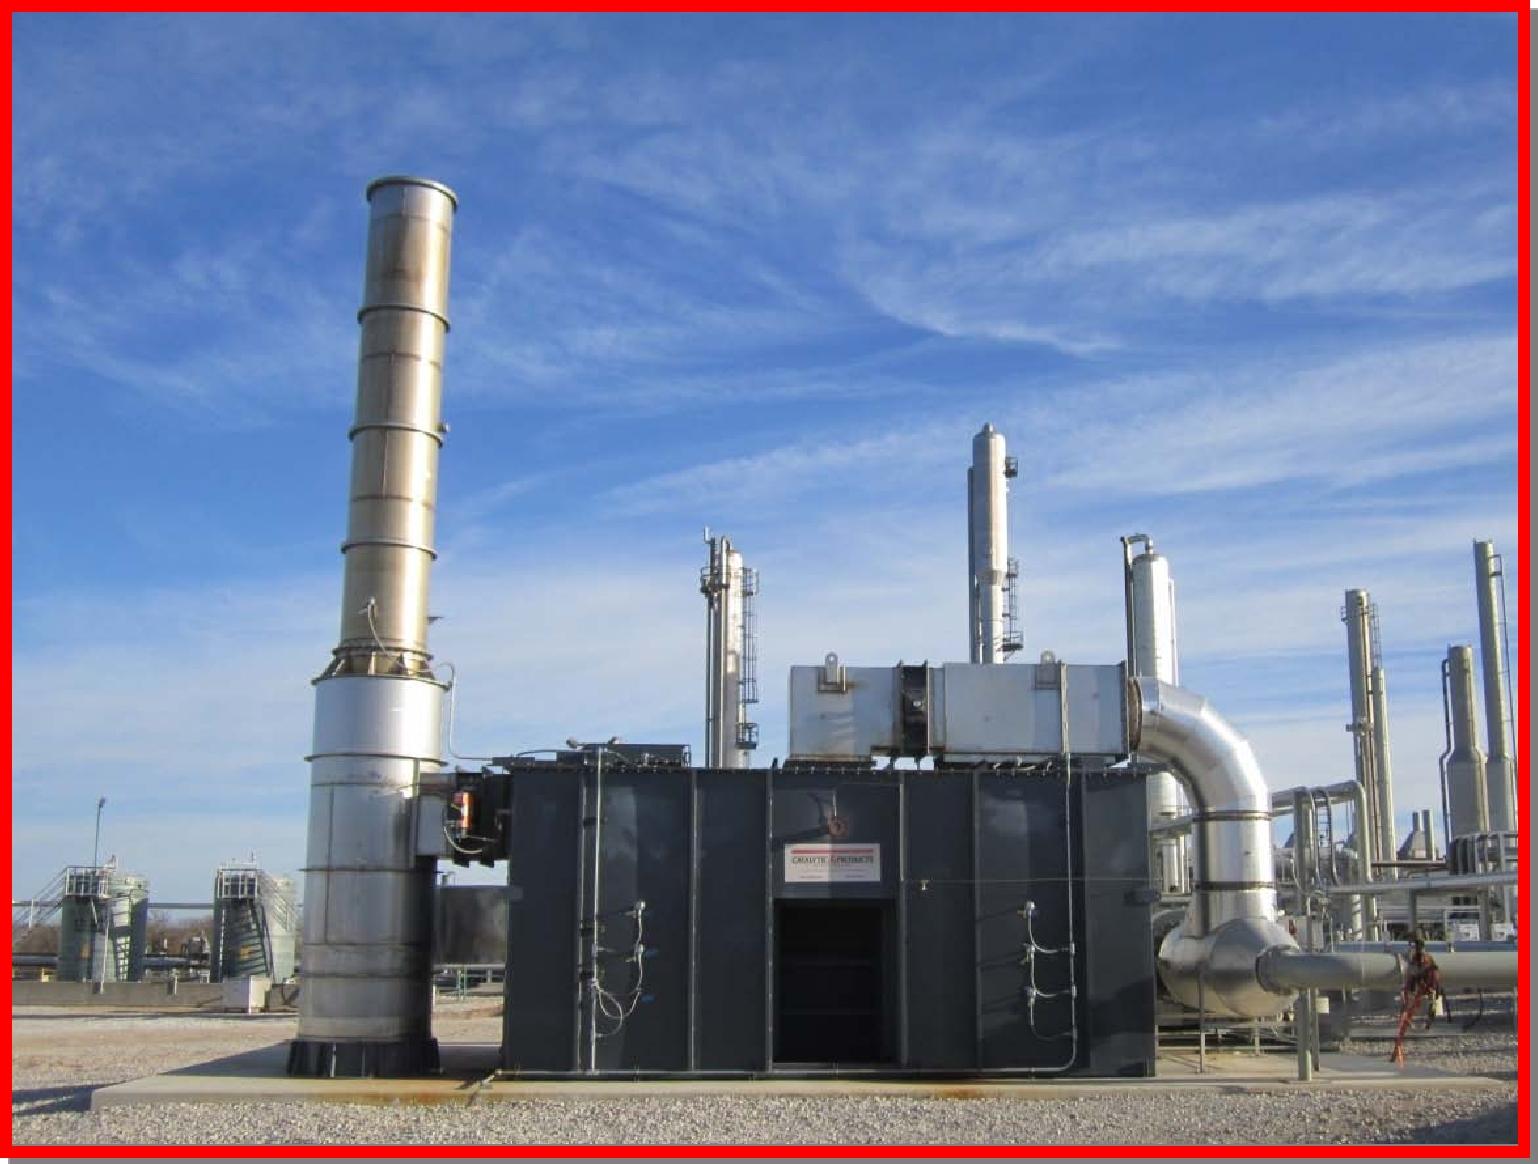 TRITON Series Regenerative Thermal Oxidizer